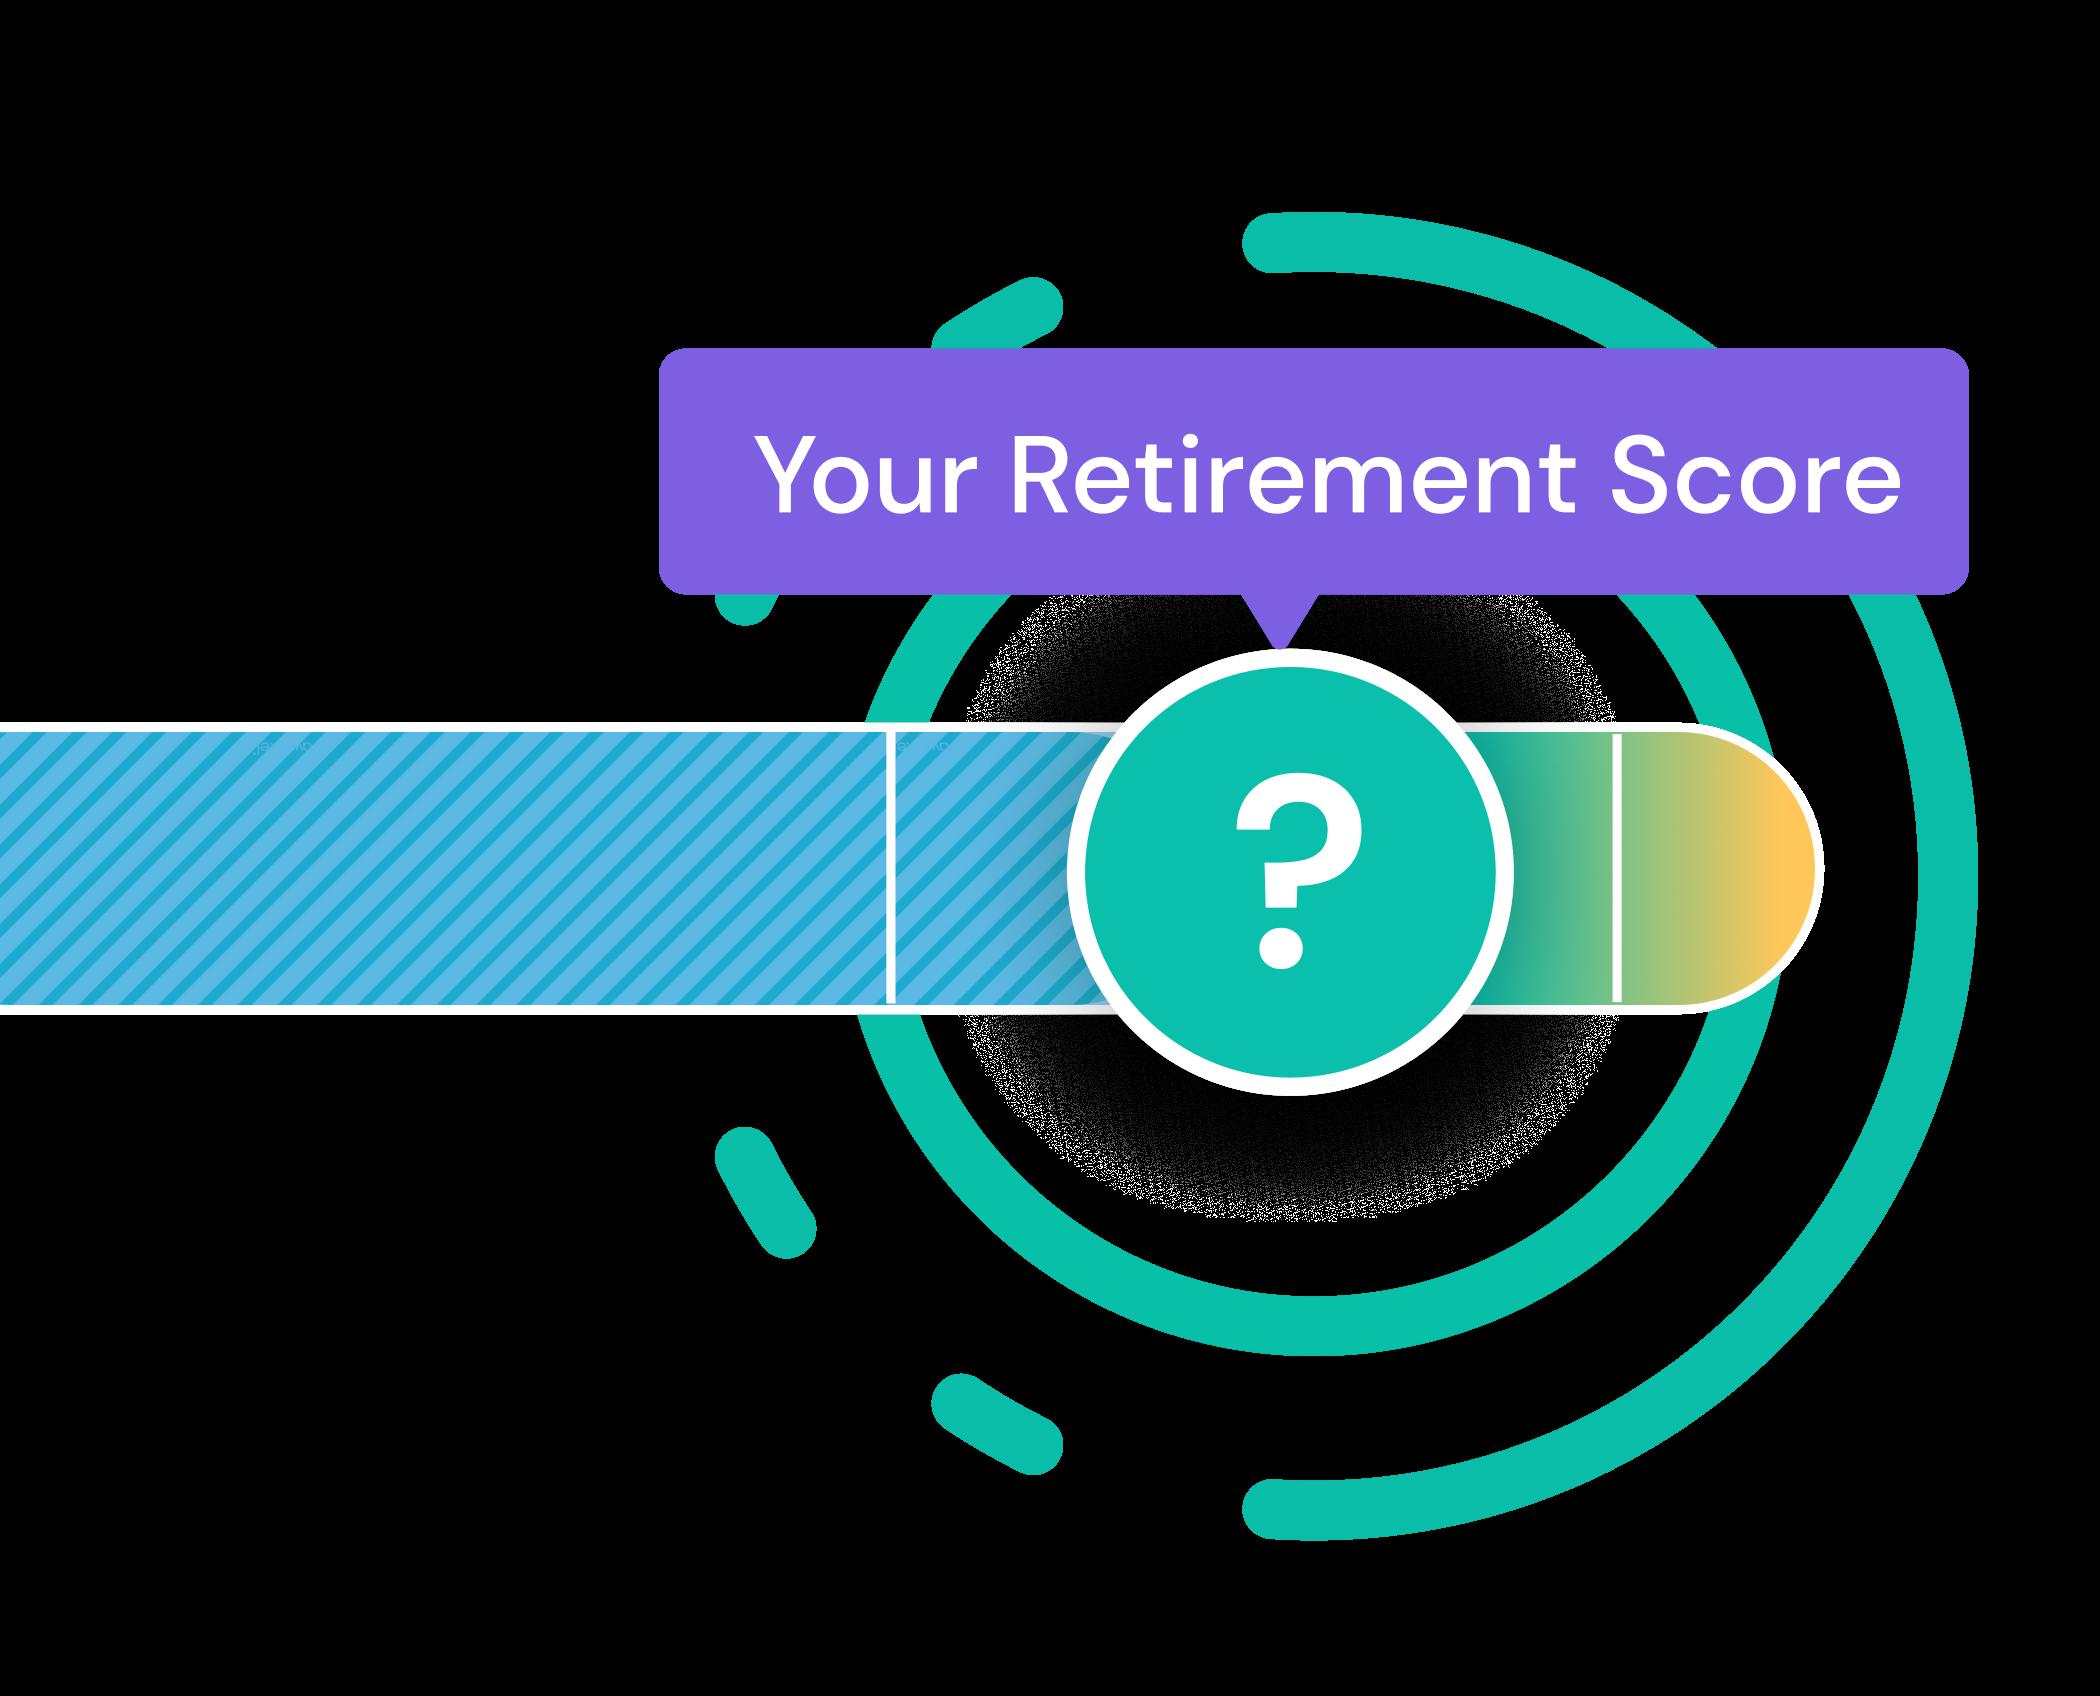 Retirement Score bar